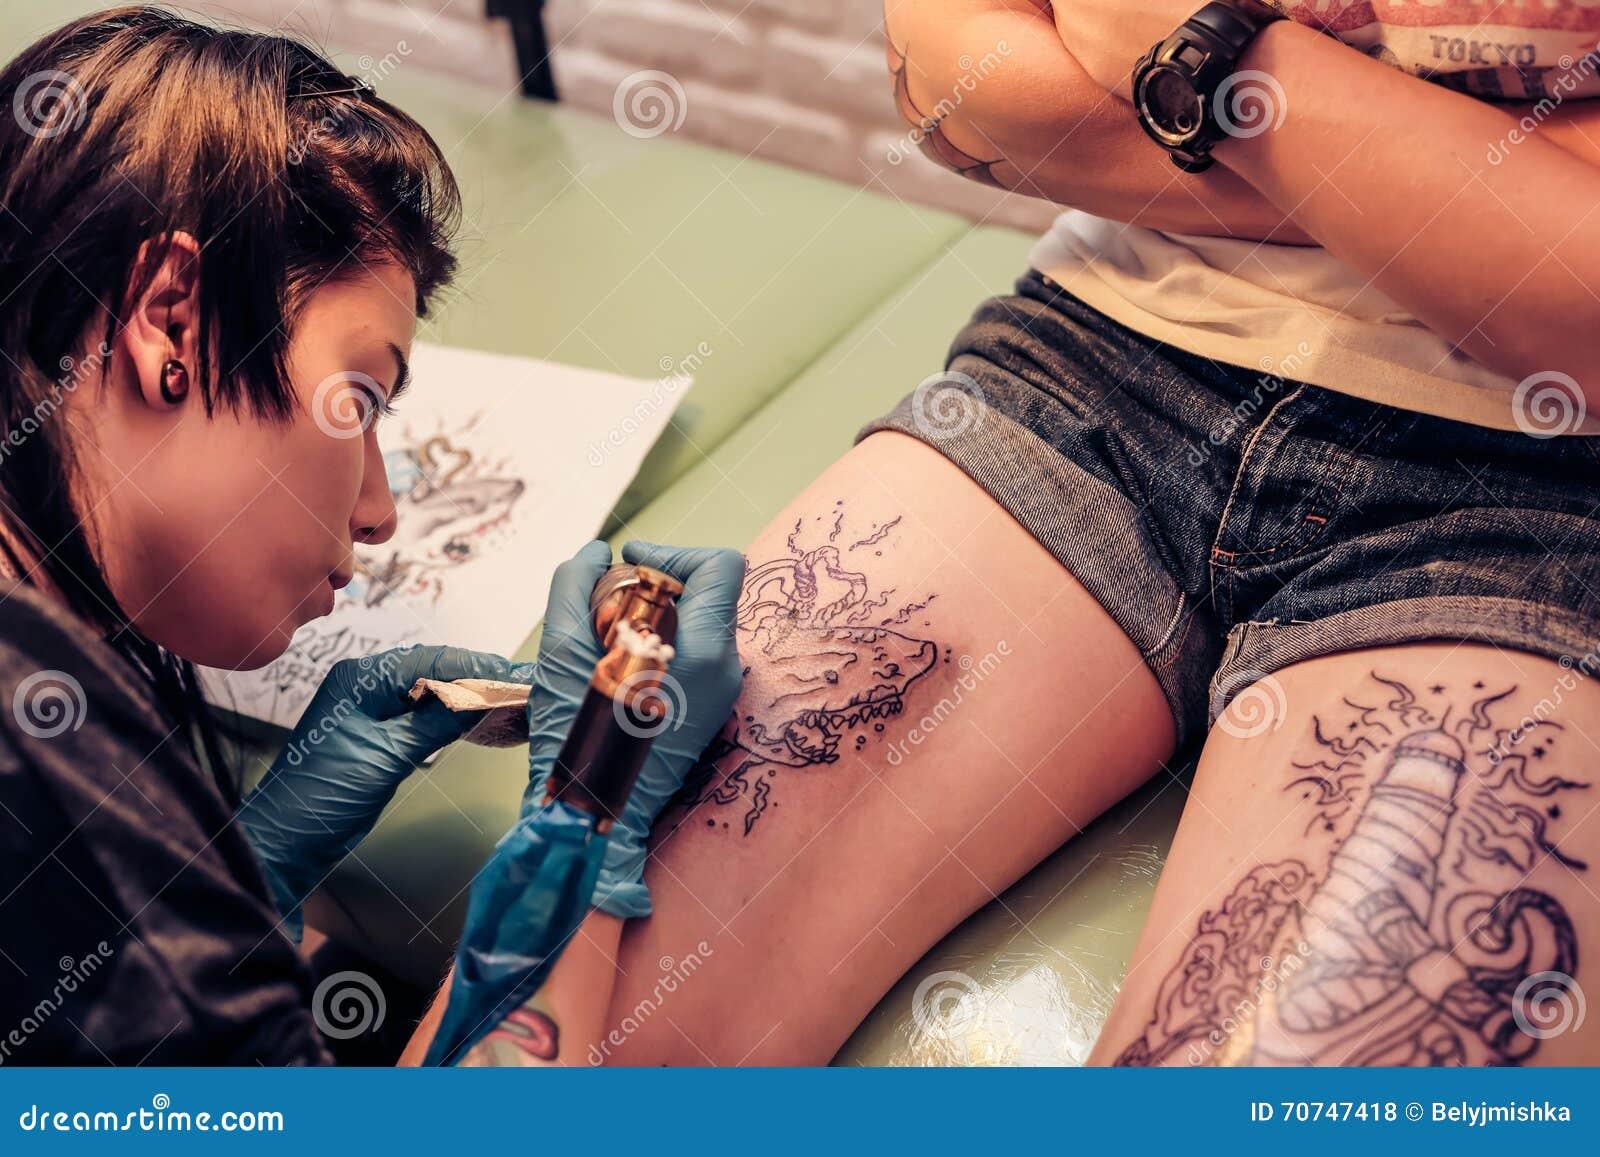 Artista Profesional Del Tatuaje Que Hace El Tatuaje Foto De Archivo